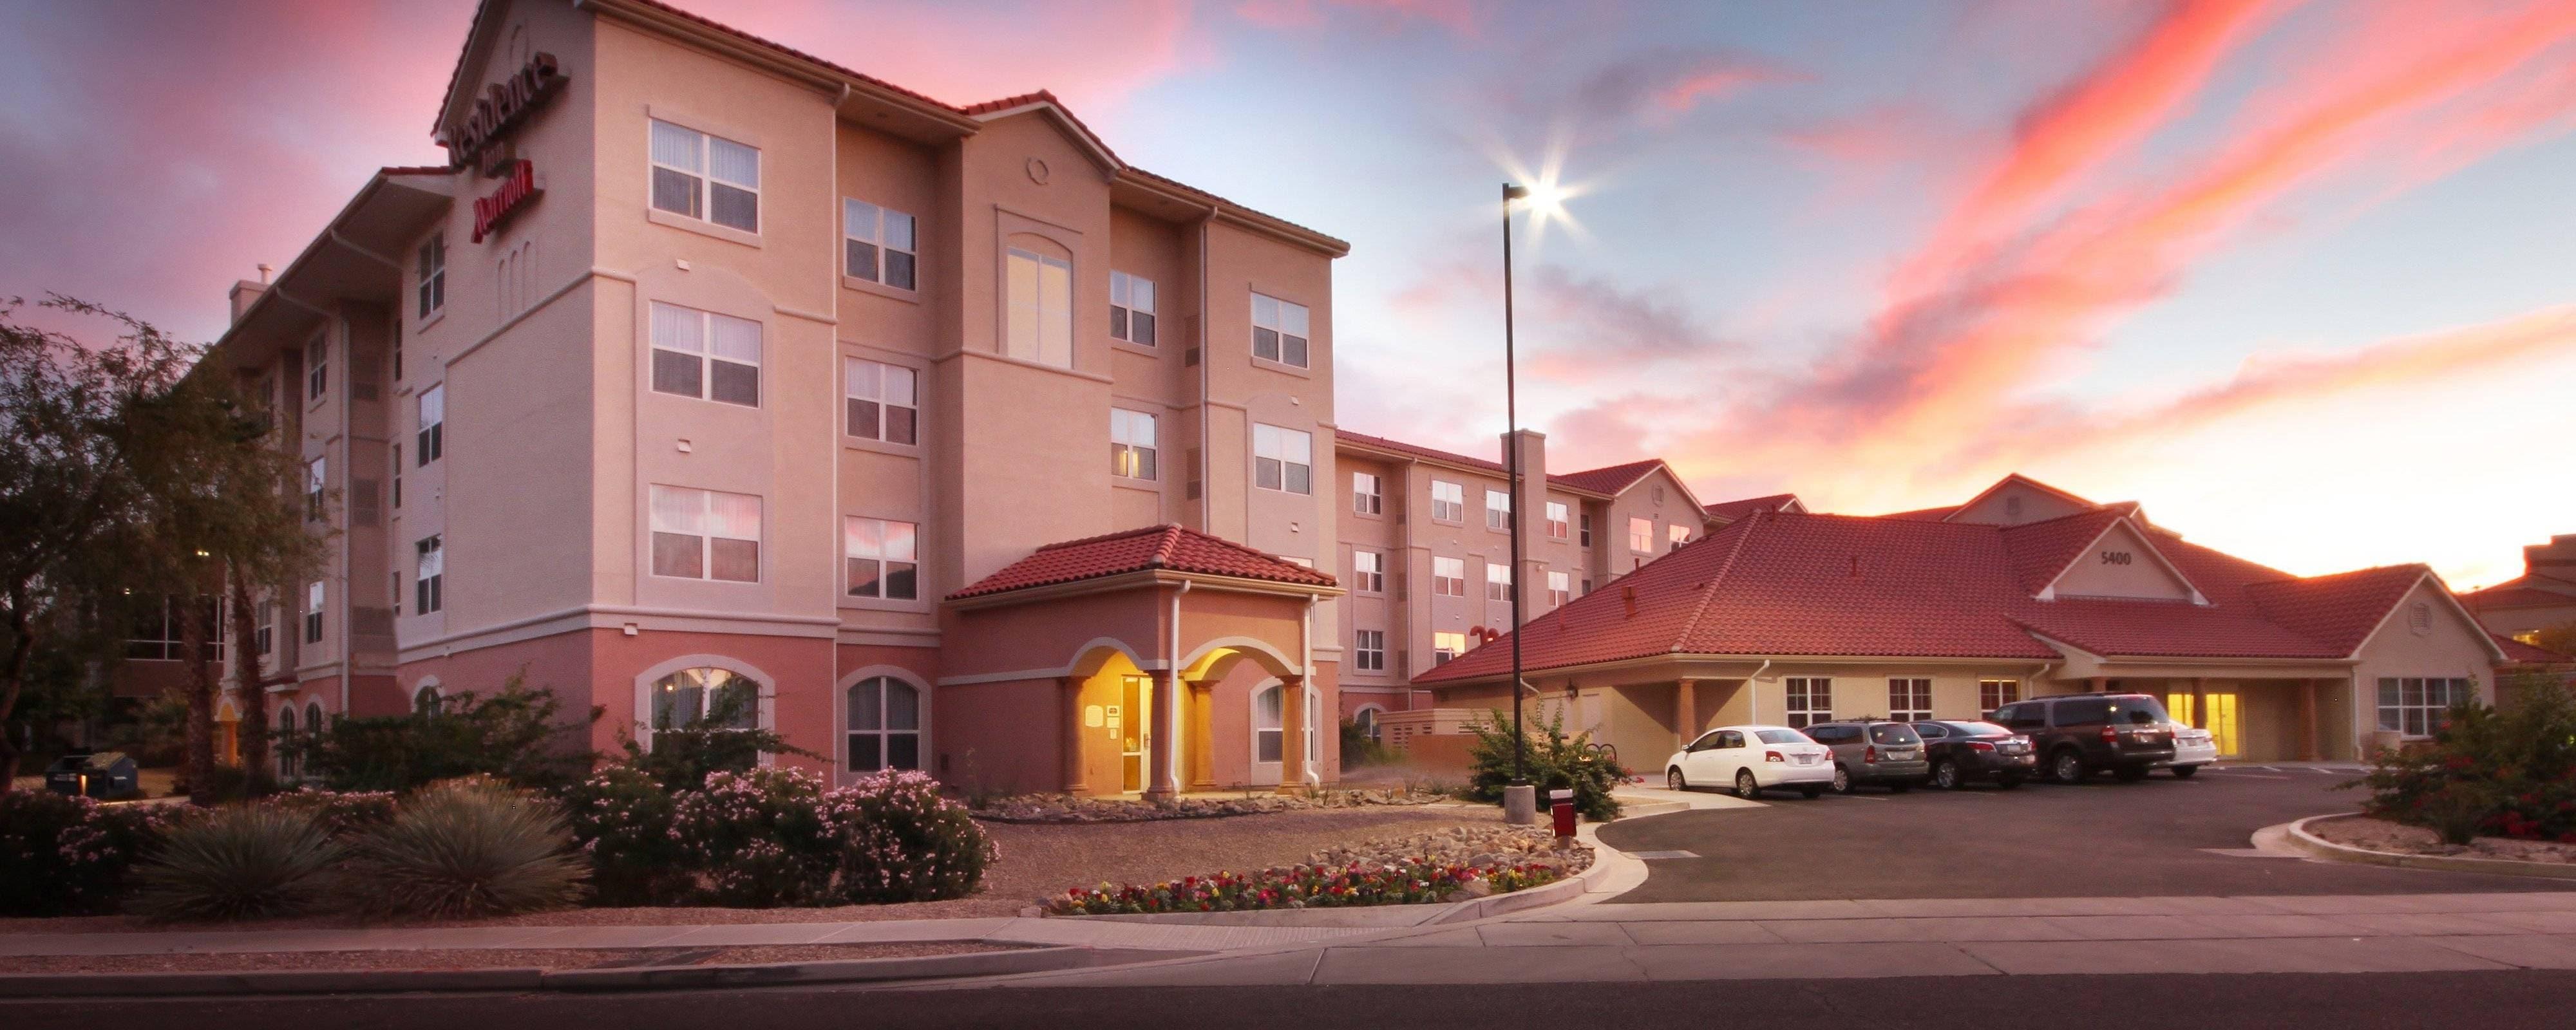 Hotel near St Joseph Hospital Tucson AZ  Residence Inn